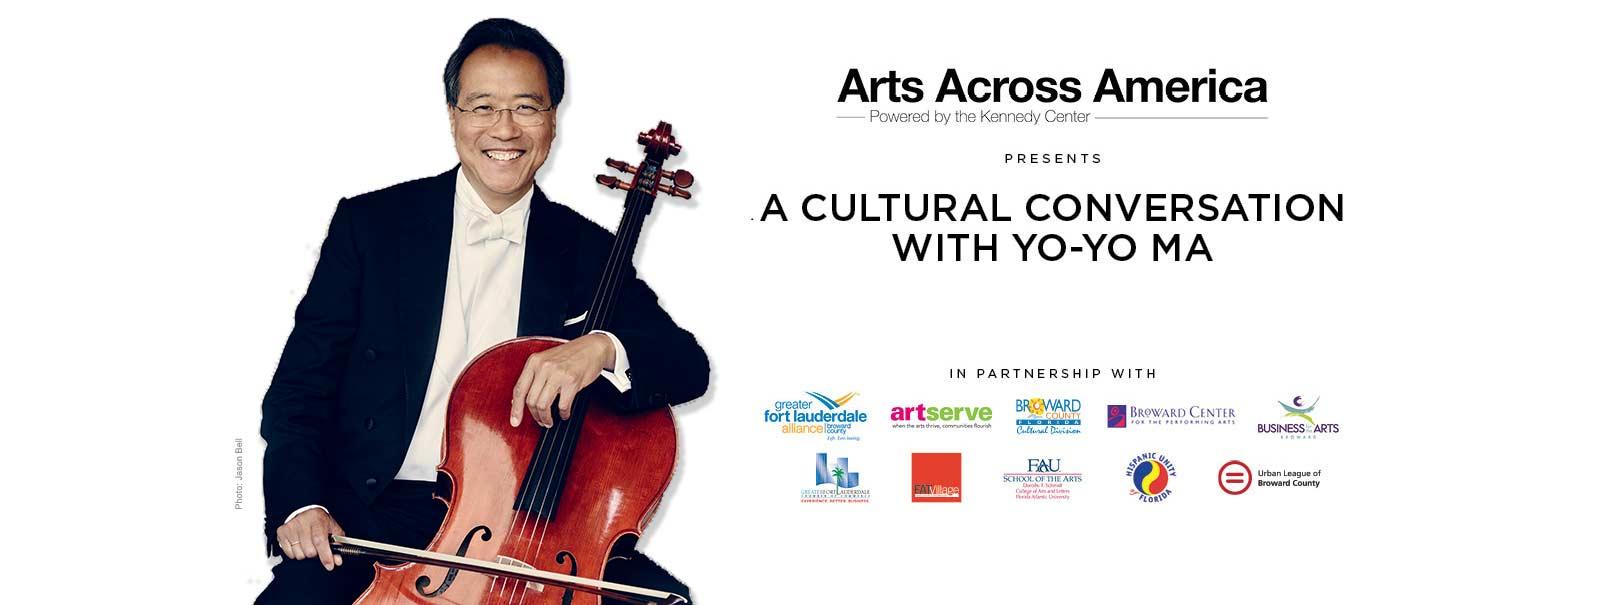 More Info - A Cultural Conversation with Yo-Yo Ma